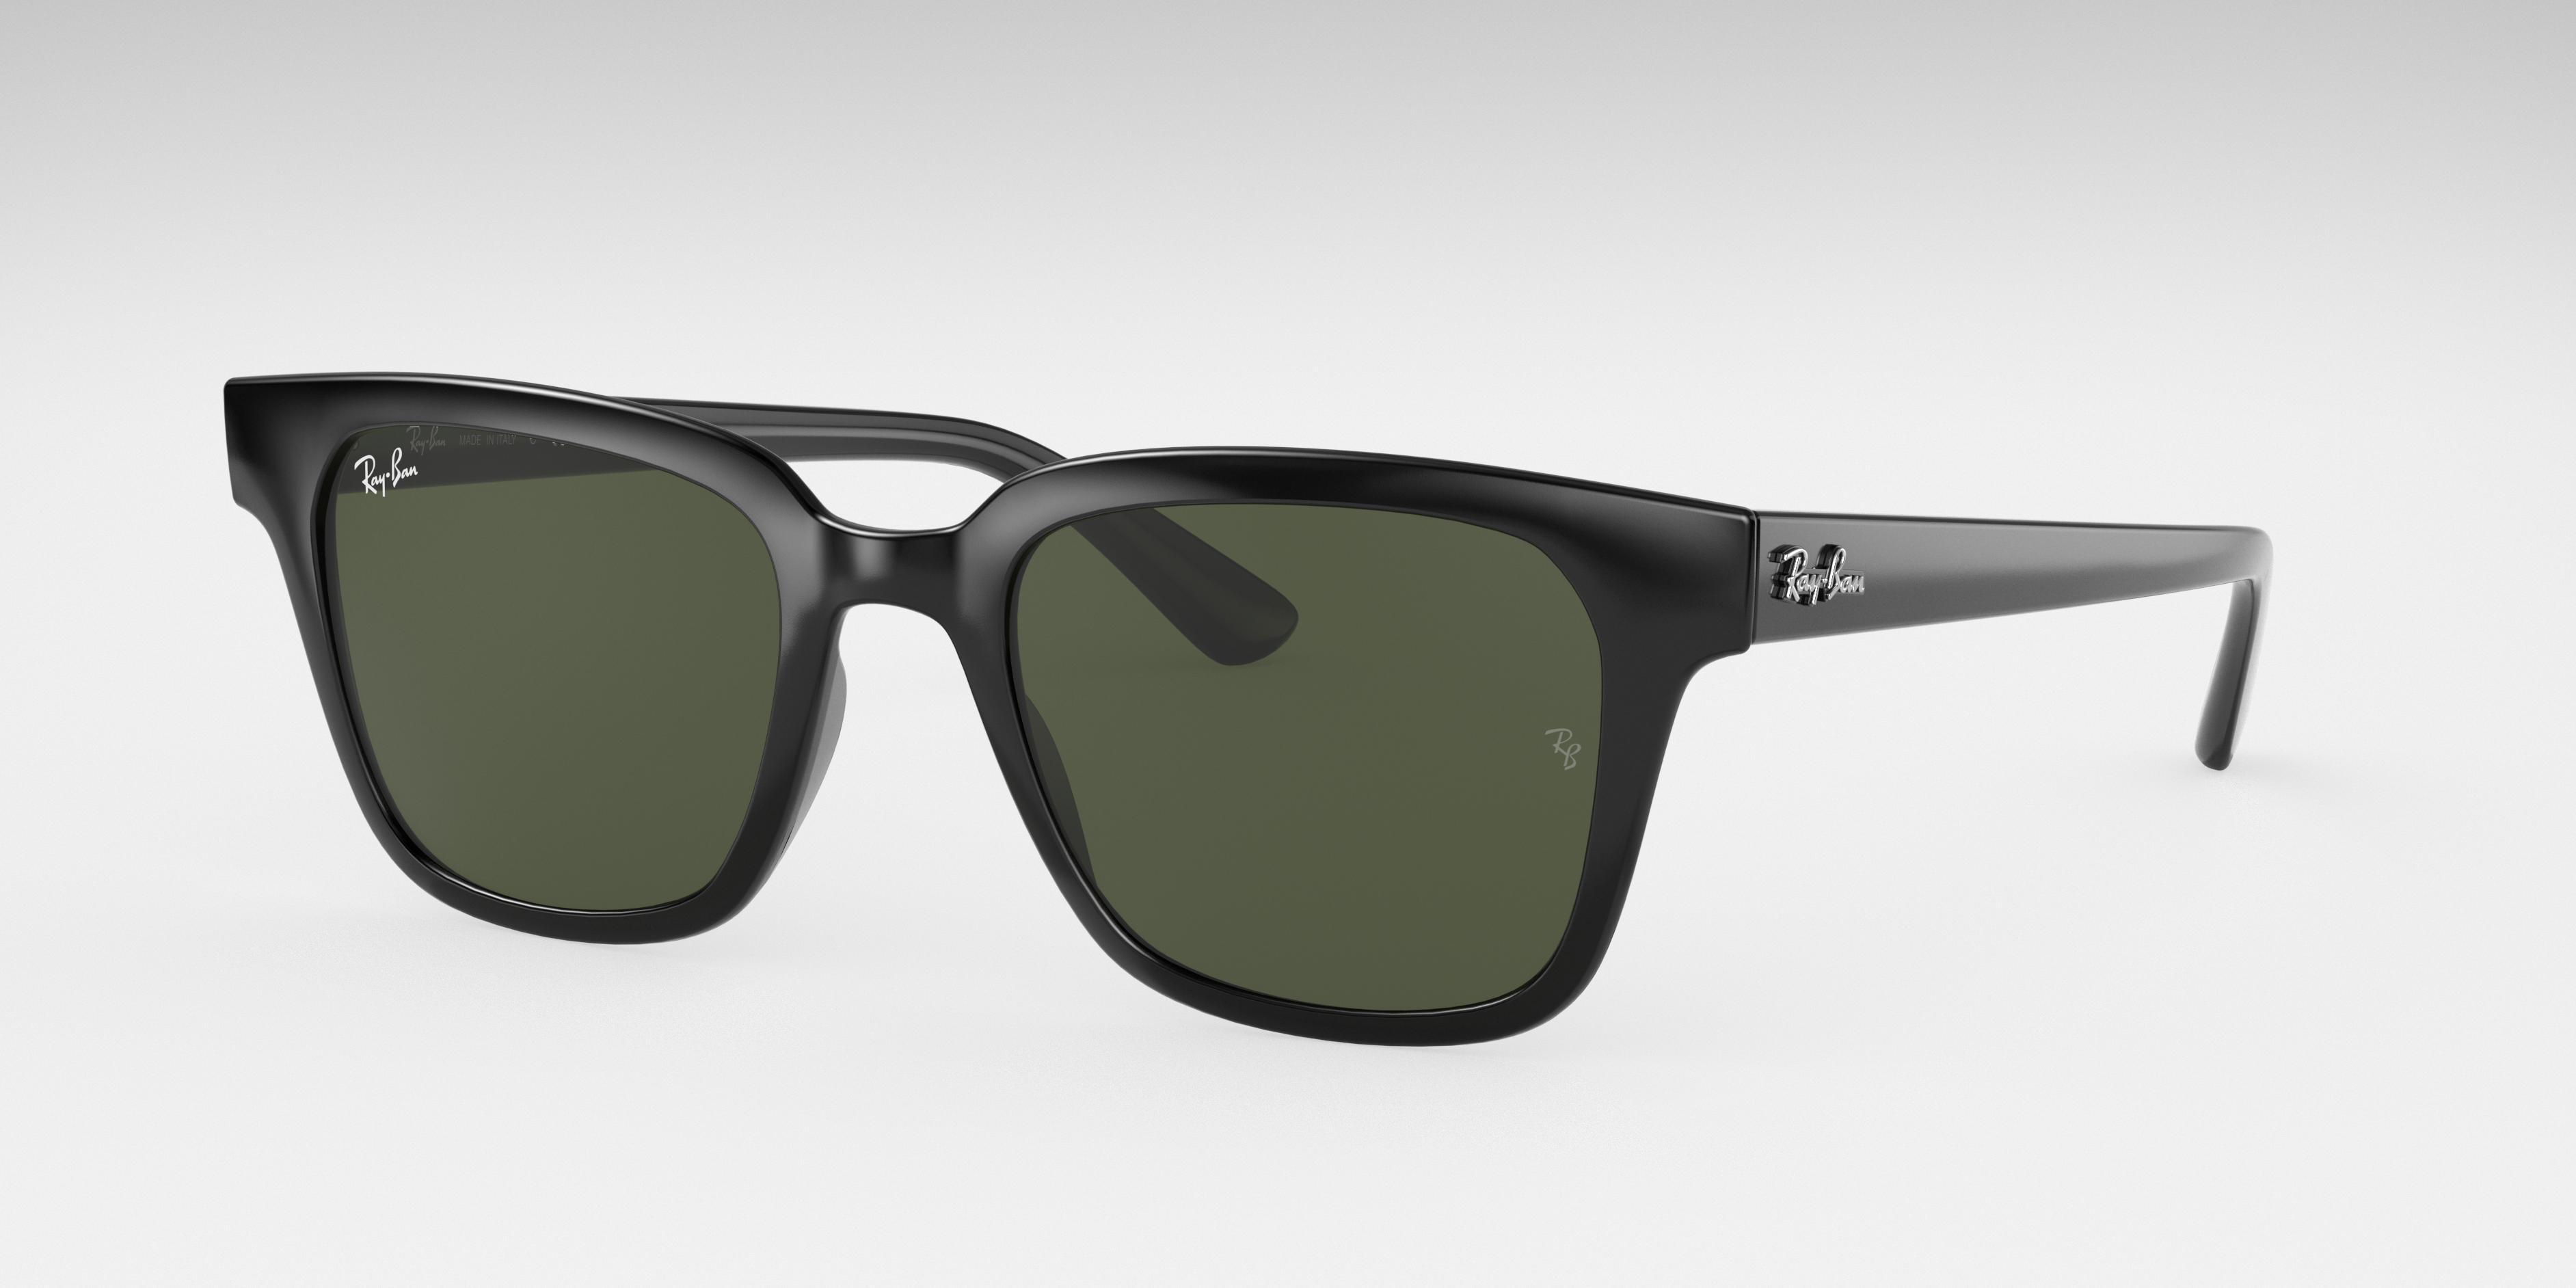 Ray-Ban Rb4323 Black, Green Lenses - RB4323